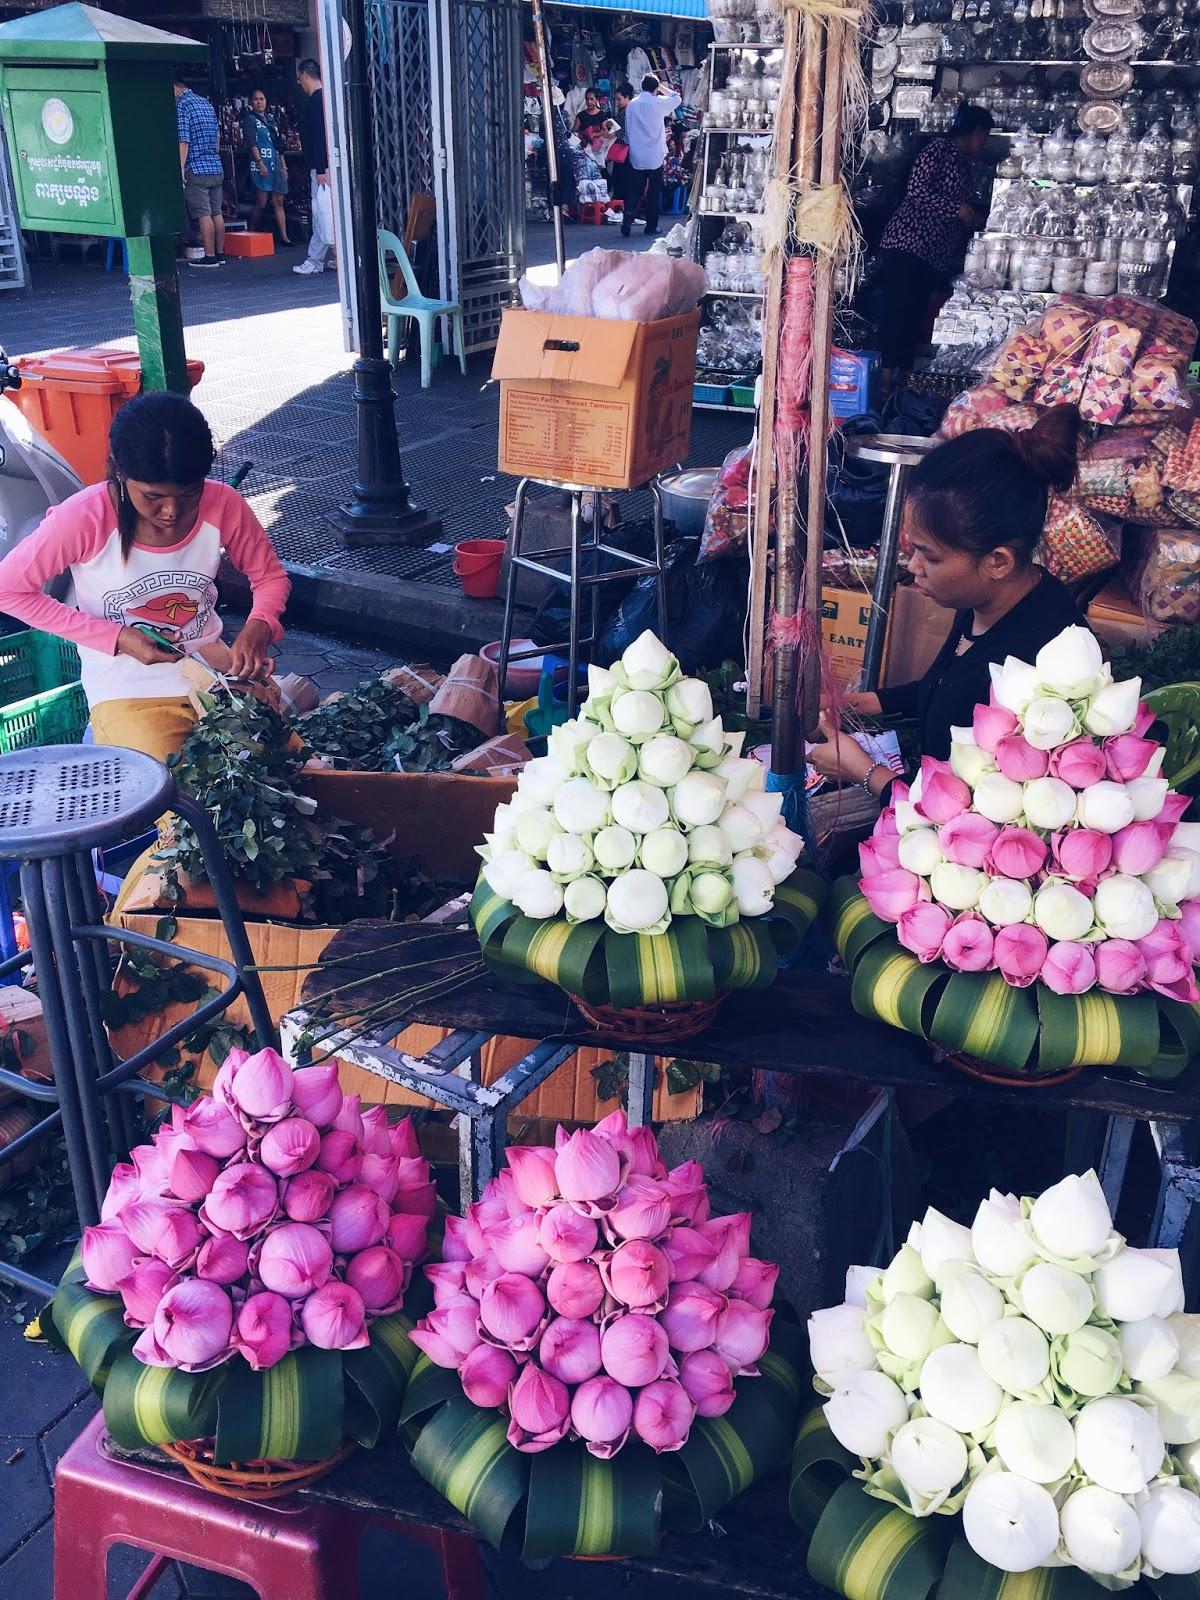 Coaching Deco Pas Cher loliland: phnom penh diary